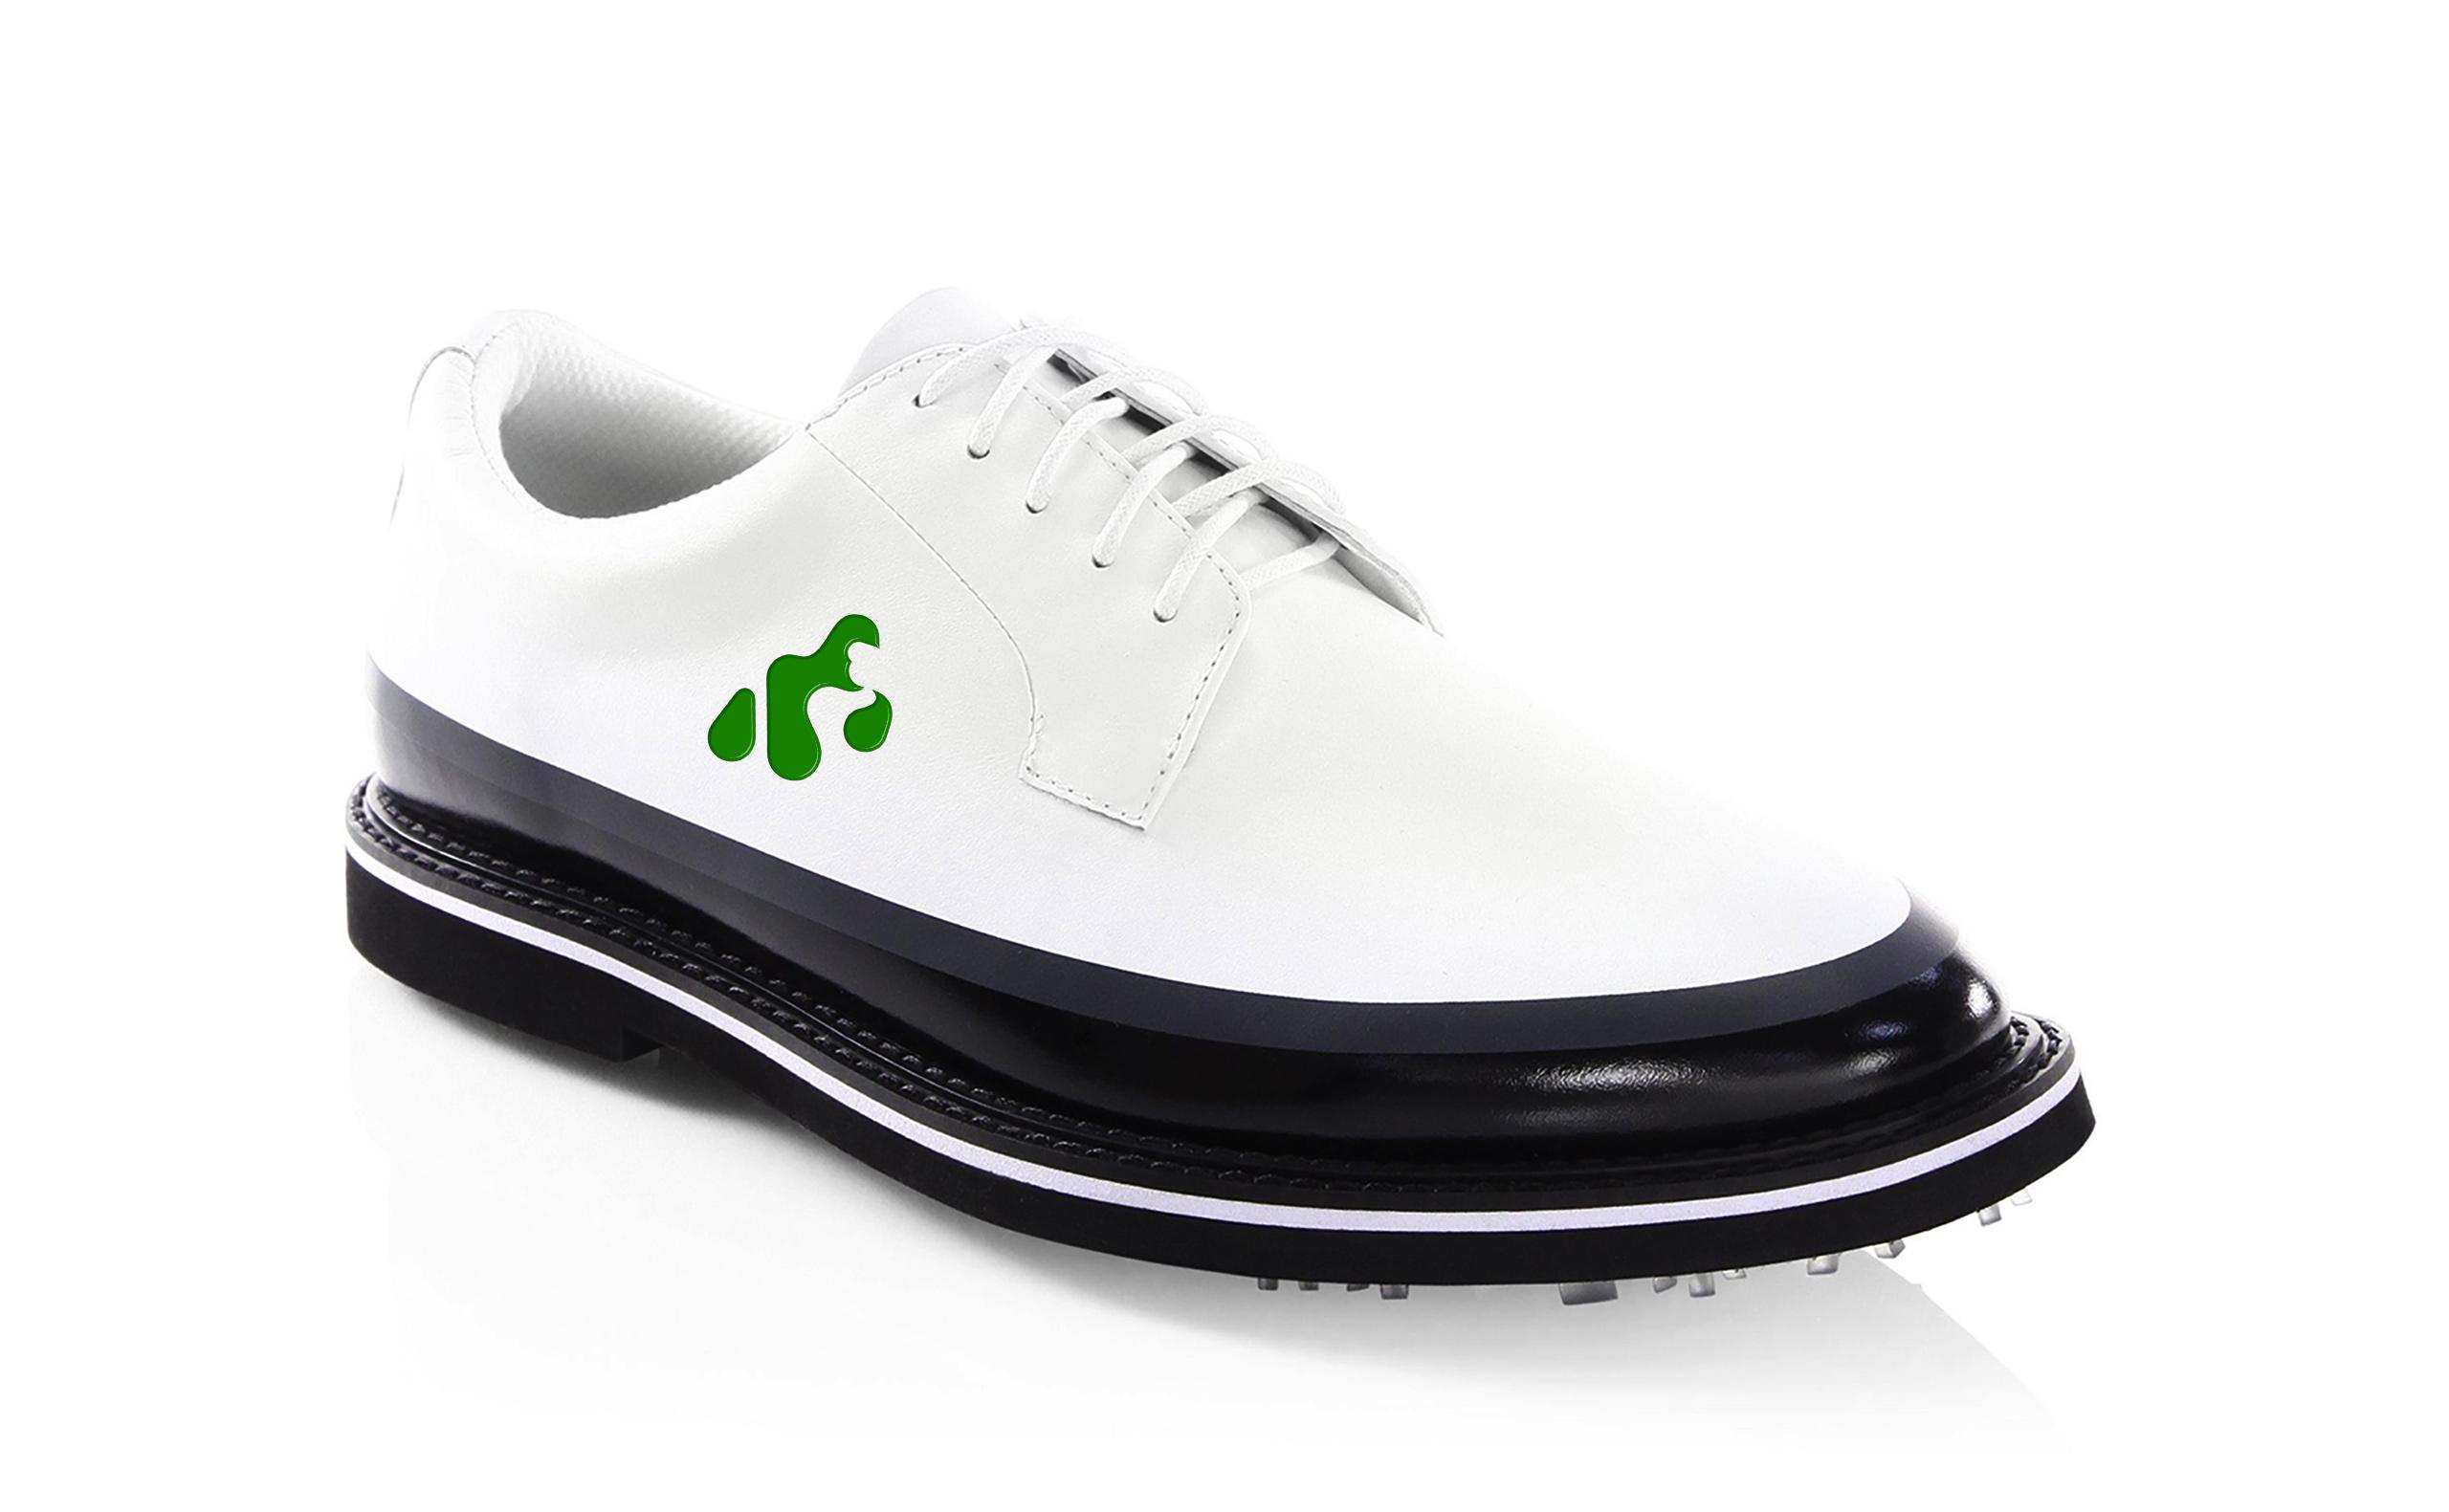 Gorilla Golf Branding Logobou Design 5